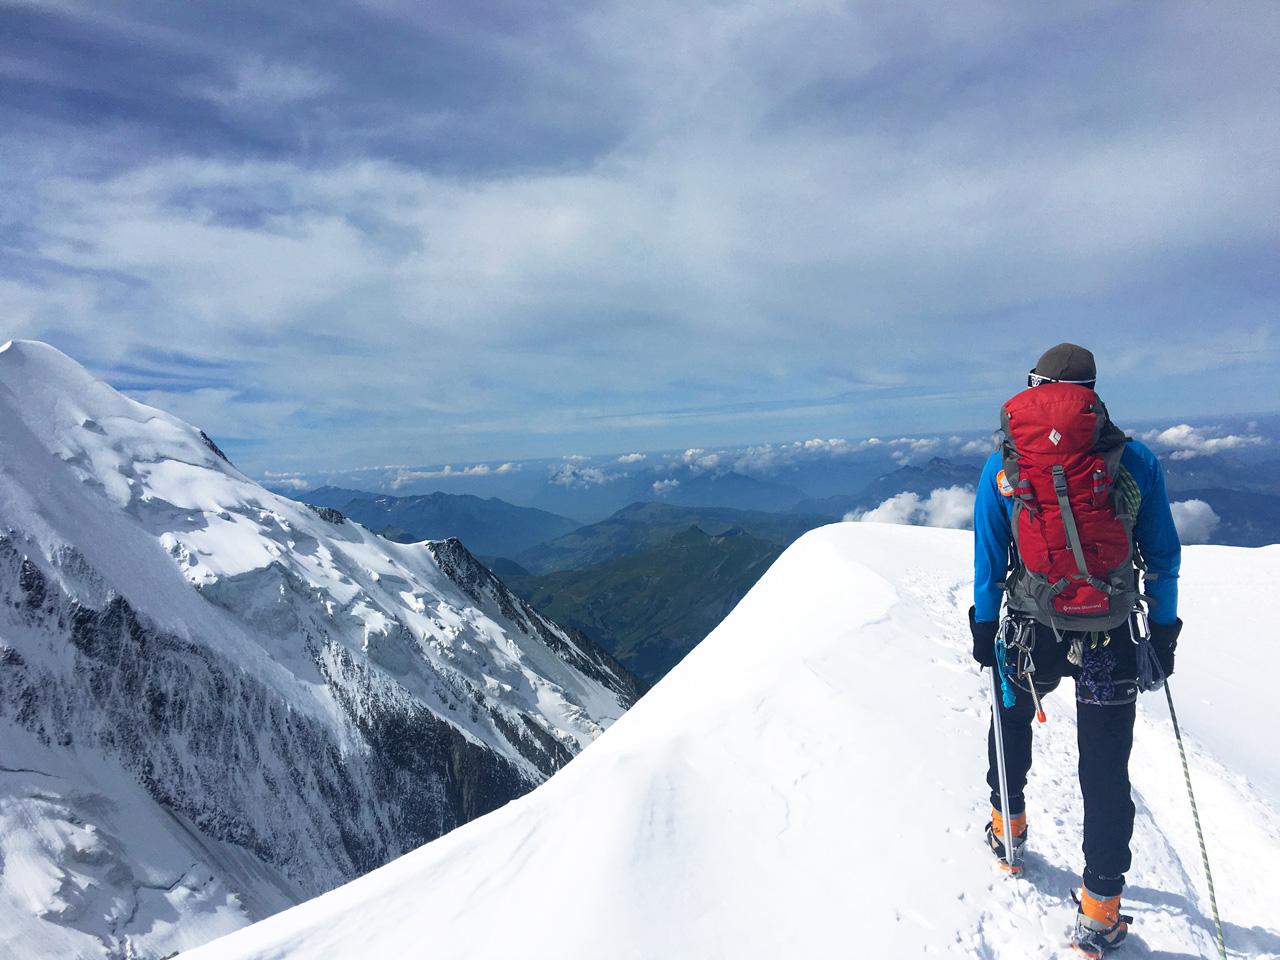 Antoine Labranche Alpinism, Mont-Blanc, France, 2016